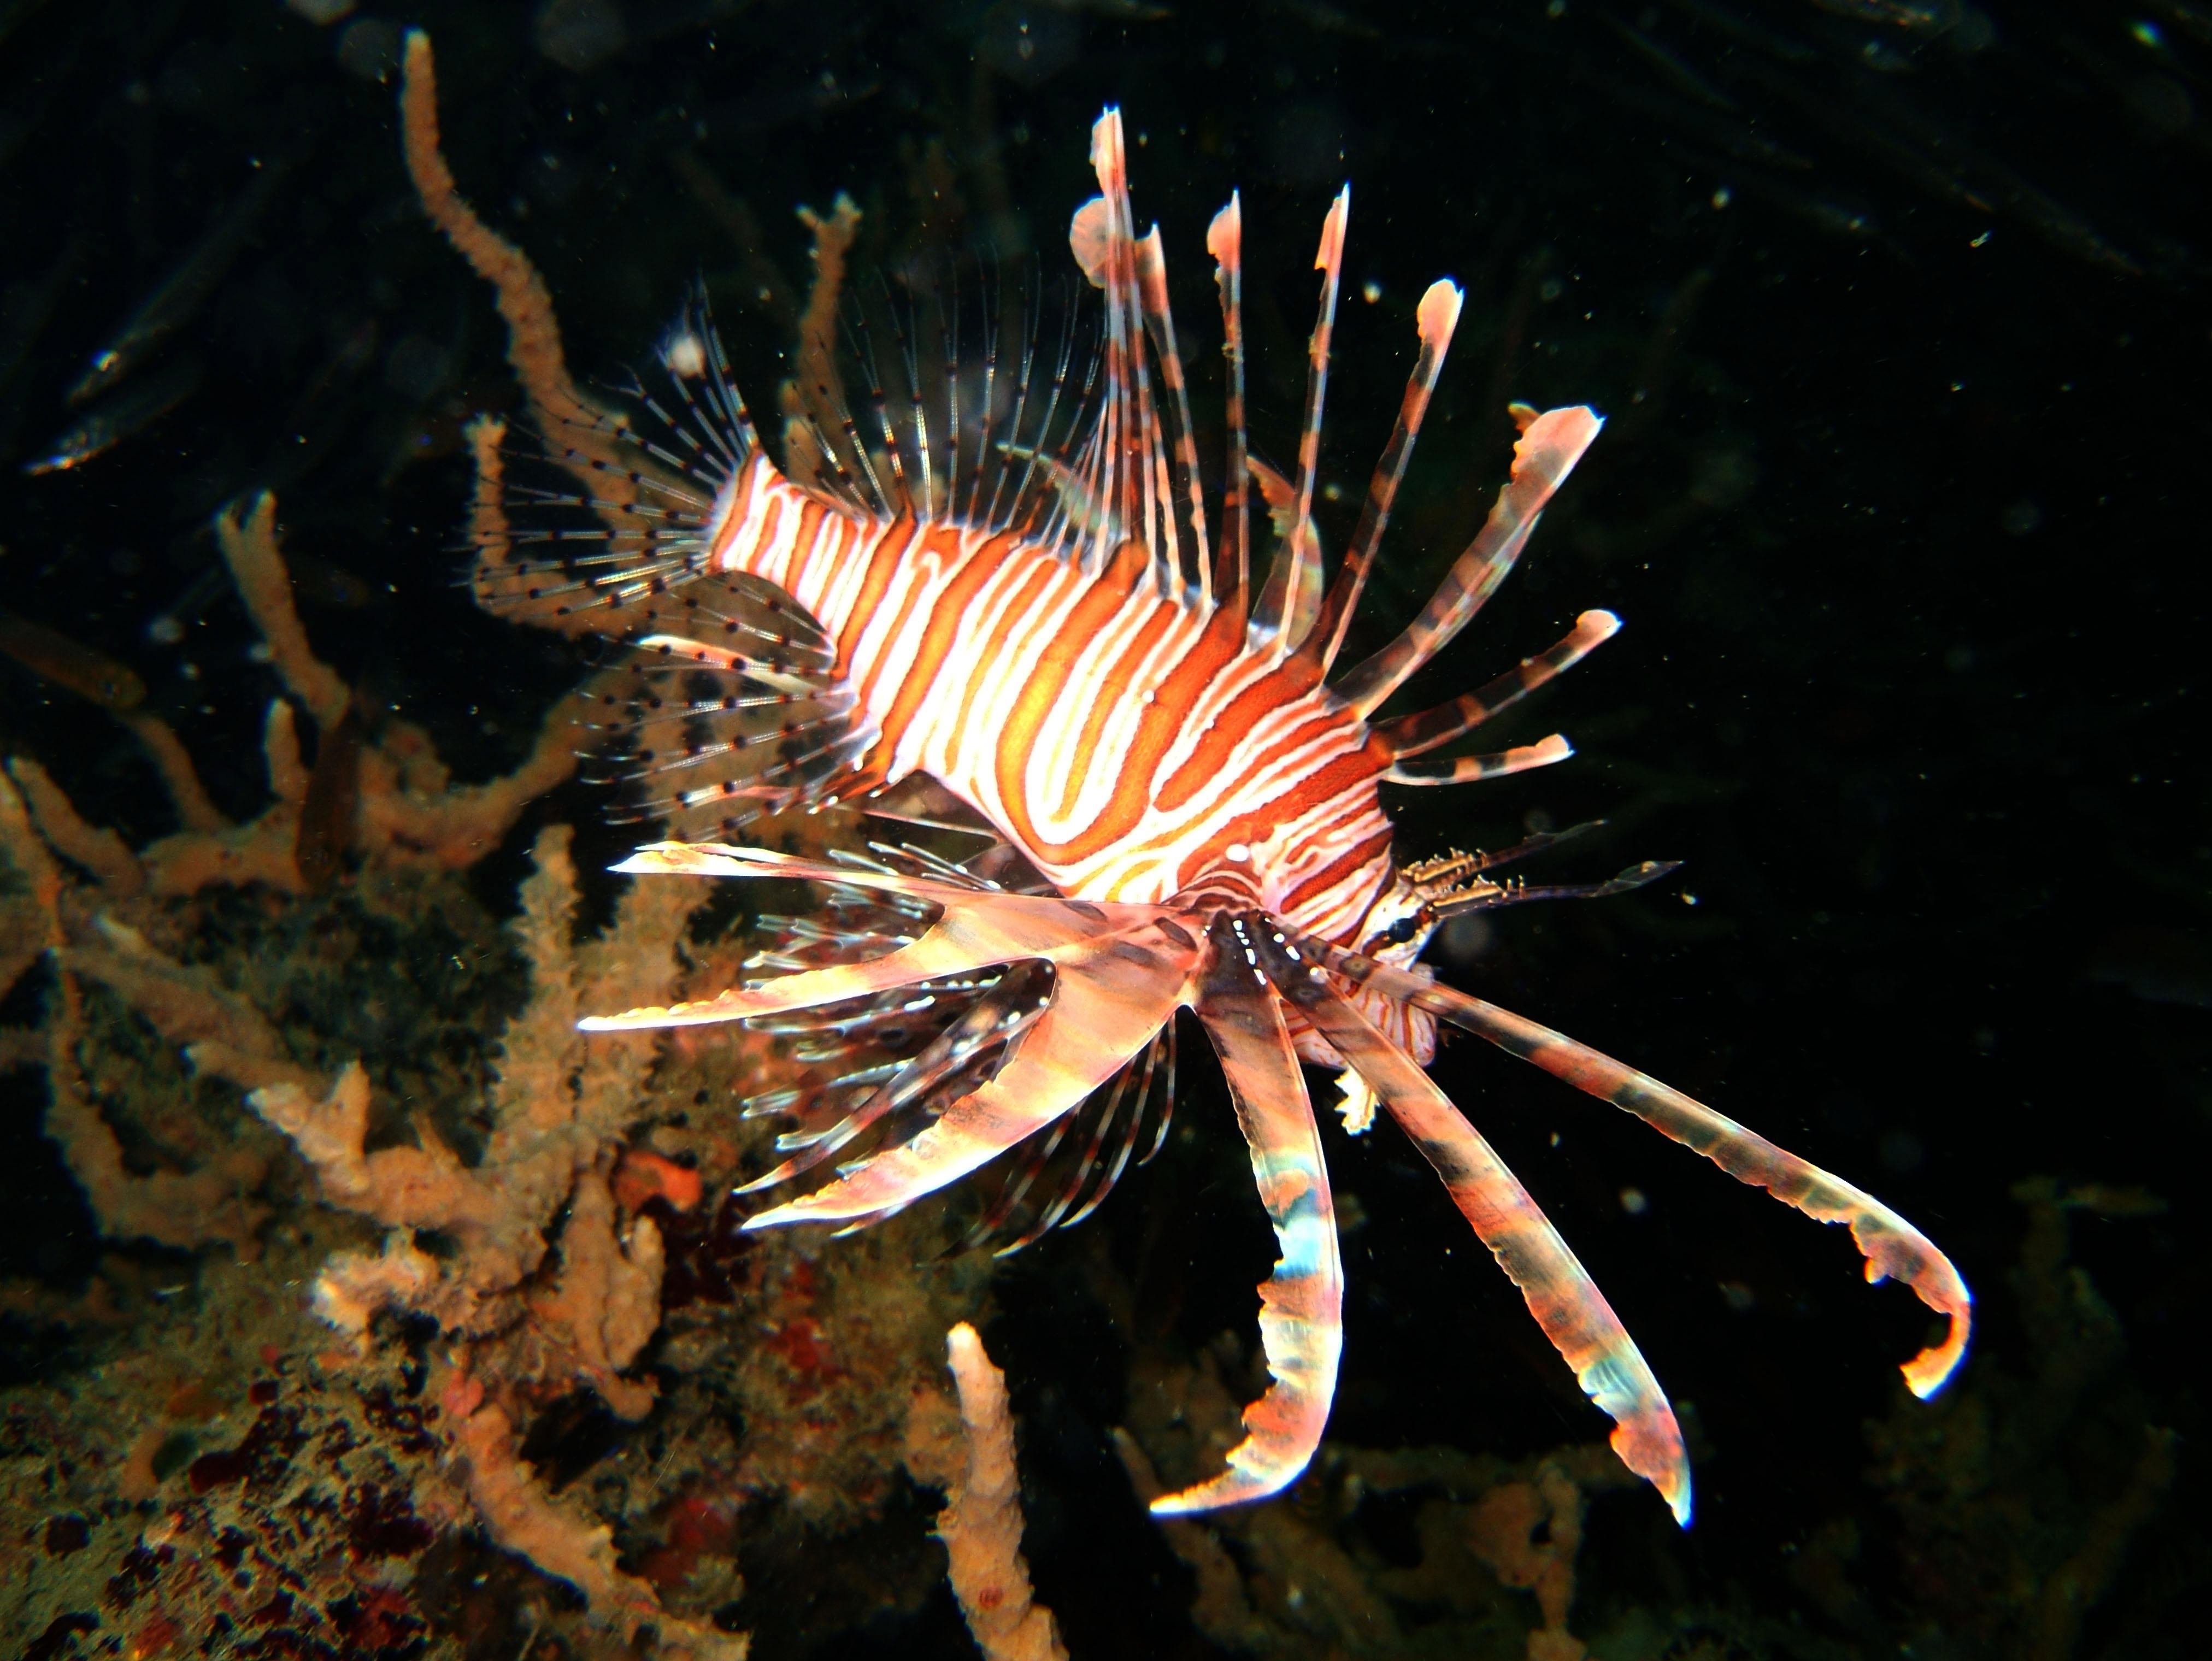 Coron dive site 2 Wreck dive IJN Taiei Maru July 2005 26